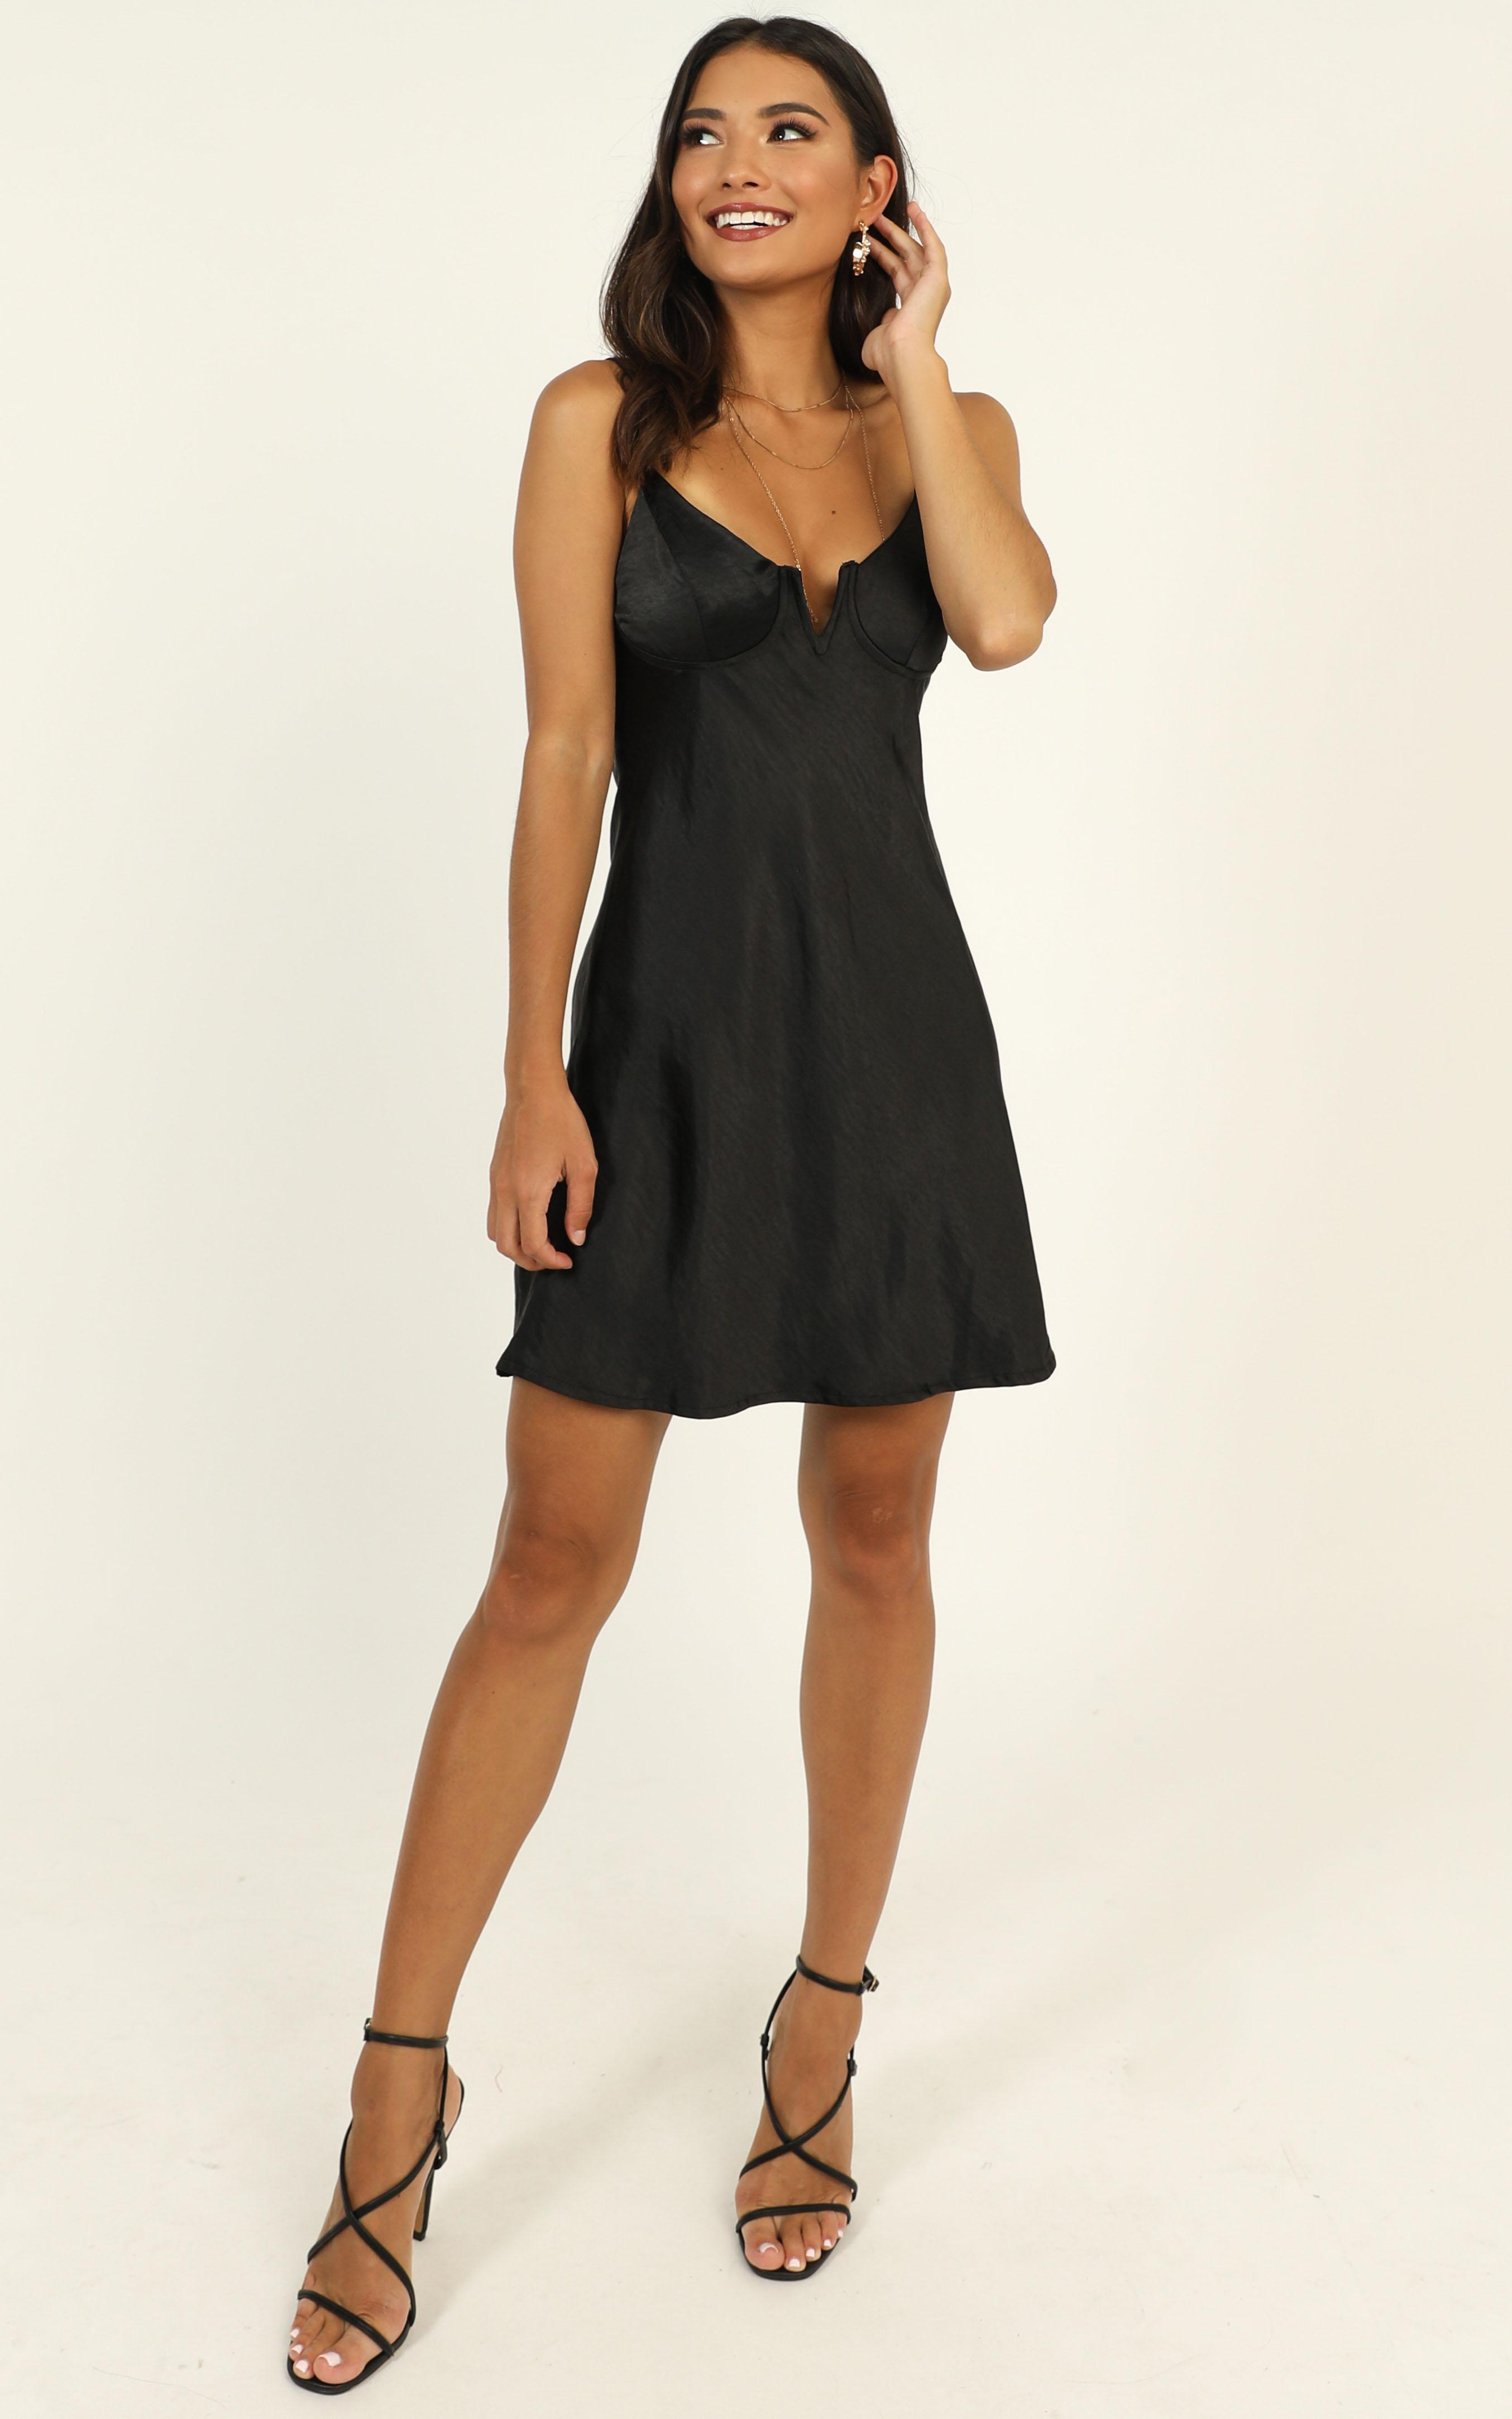 Pretty Persuasive Dress in black satin - 12 (L), Black, hi-res image number null